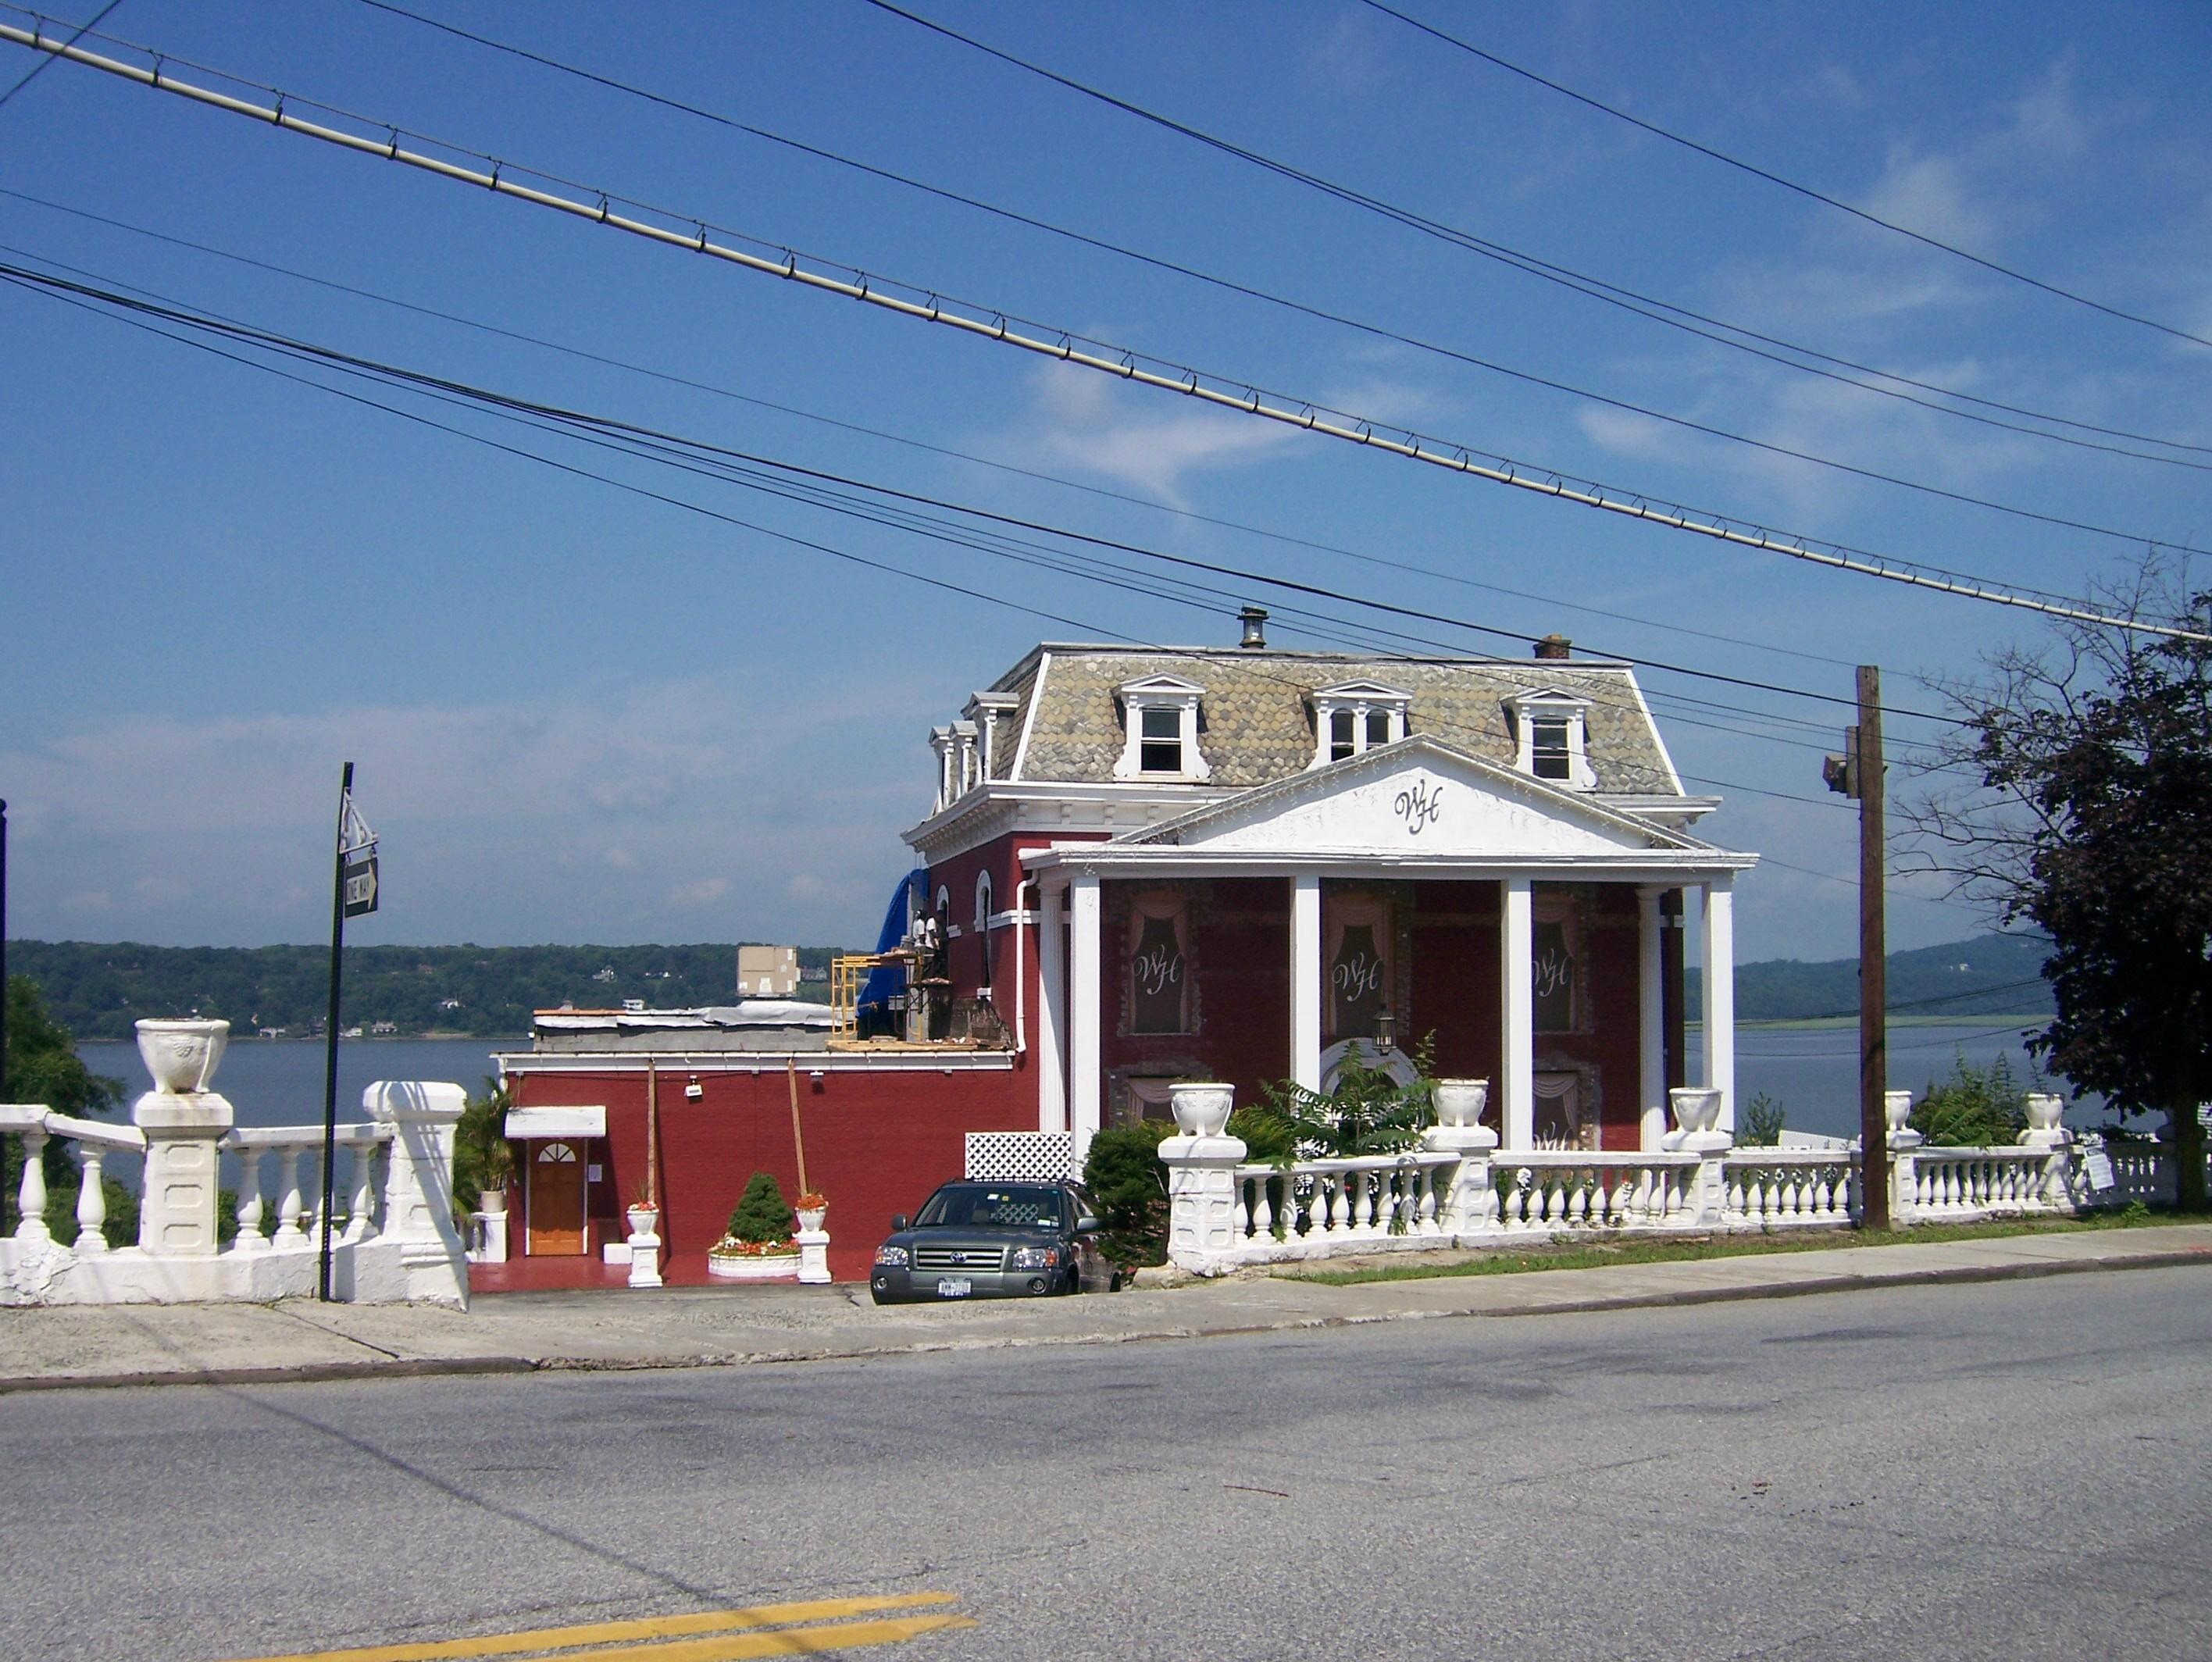 Dobbs Ferry Hudson River Views In Peril | Rivertowns Real Estate News